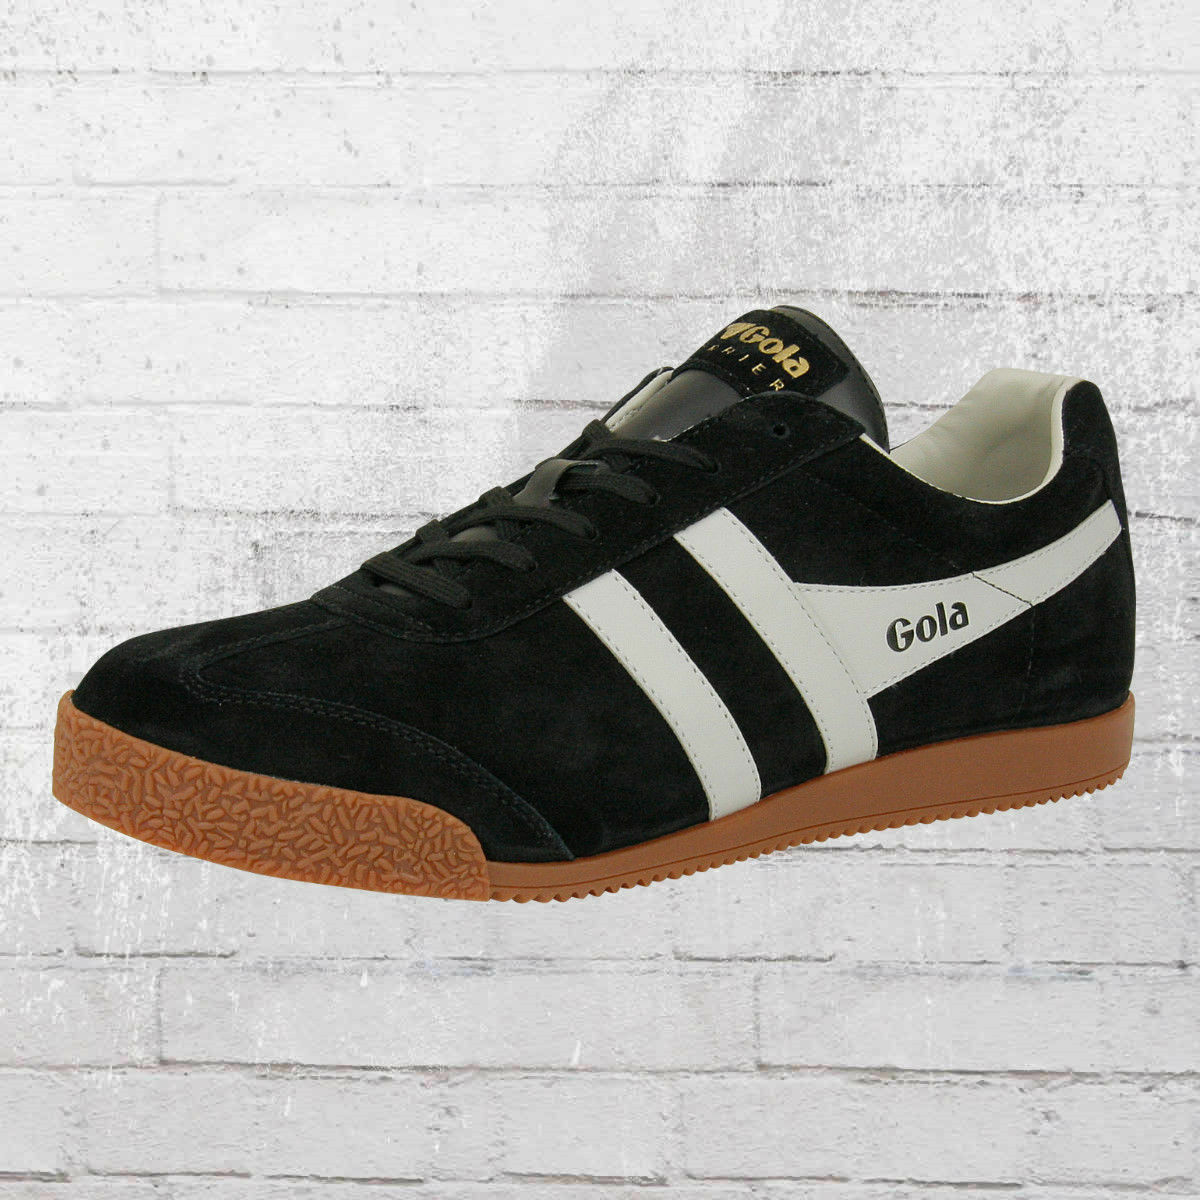 Gola Herren Schuhe Harrier Suede Retro Sneaker schwarz grau Männer Men Shoes